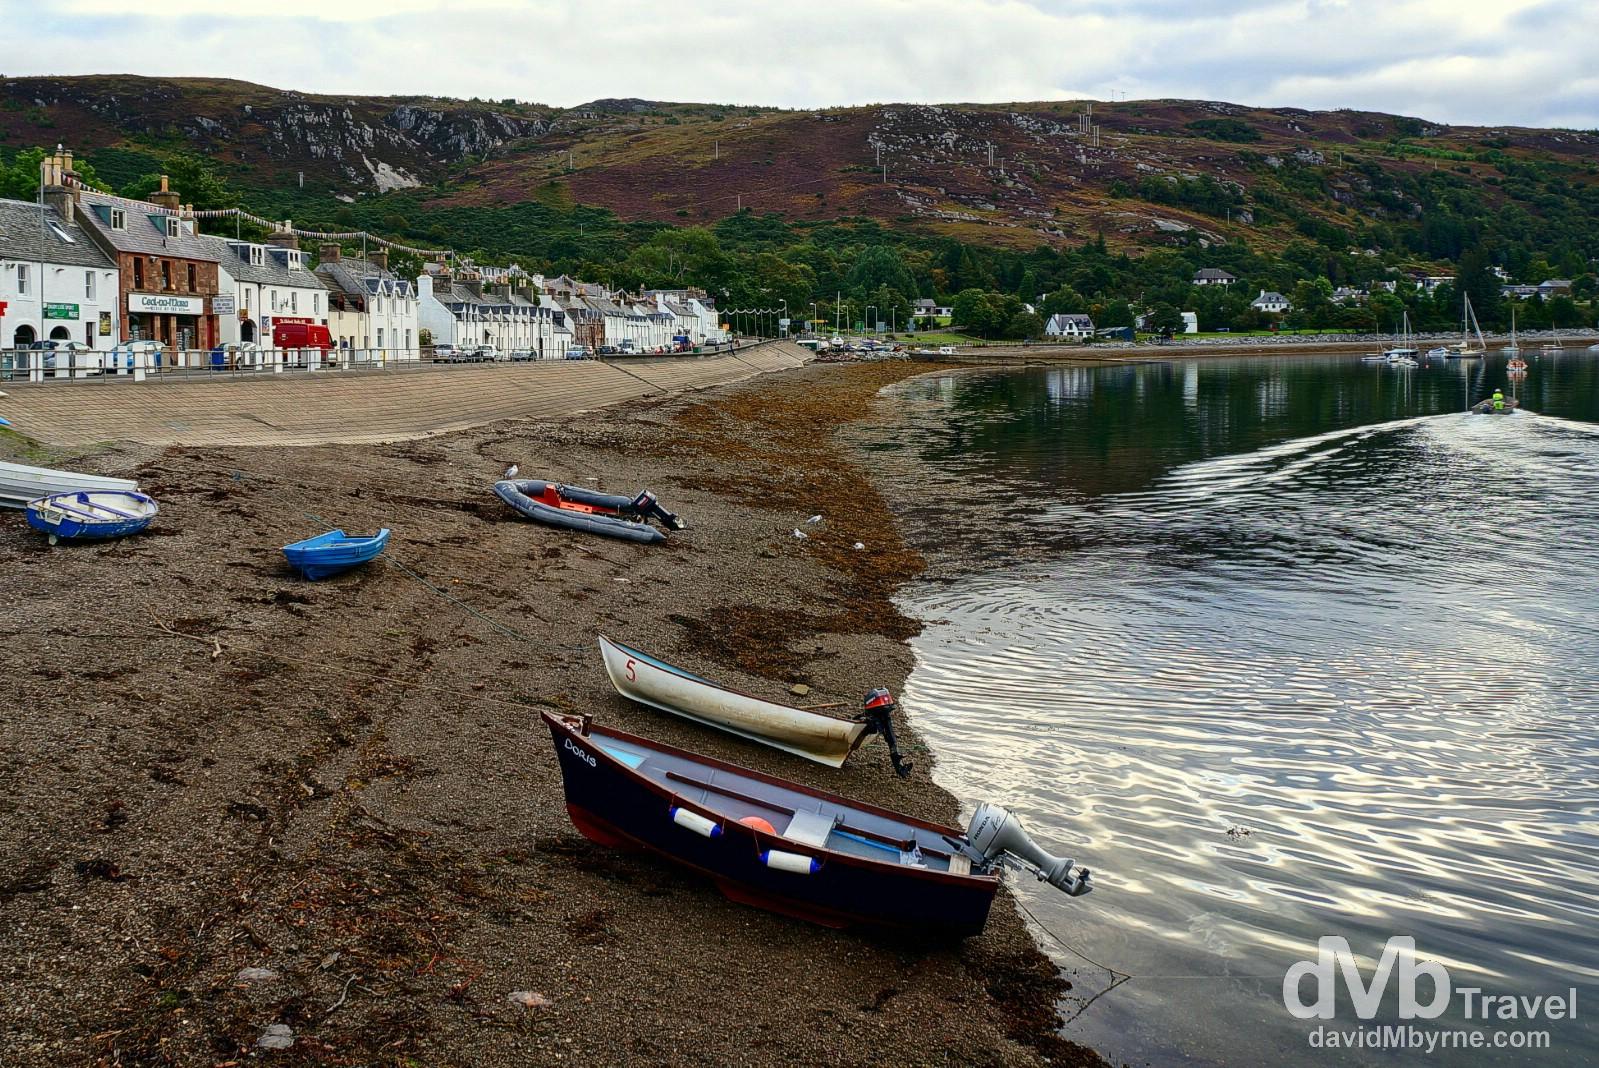 Ullapool, Highlands, Scotland. September 16, 2014.